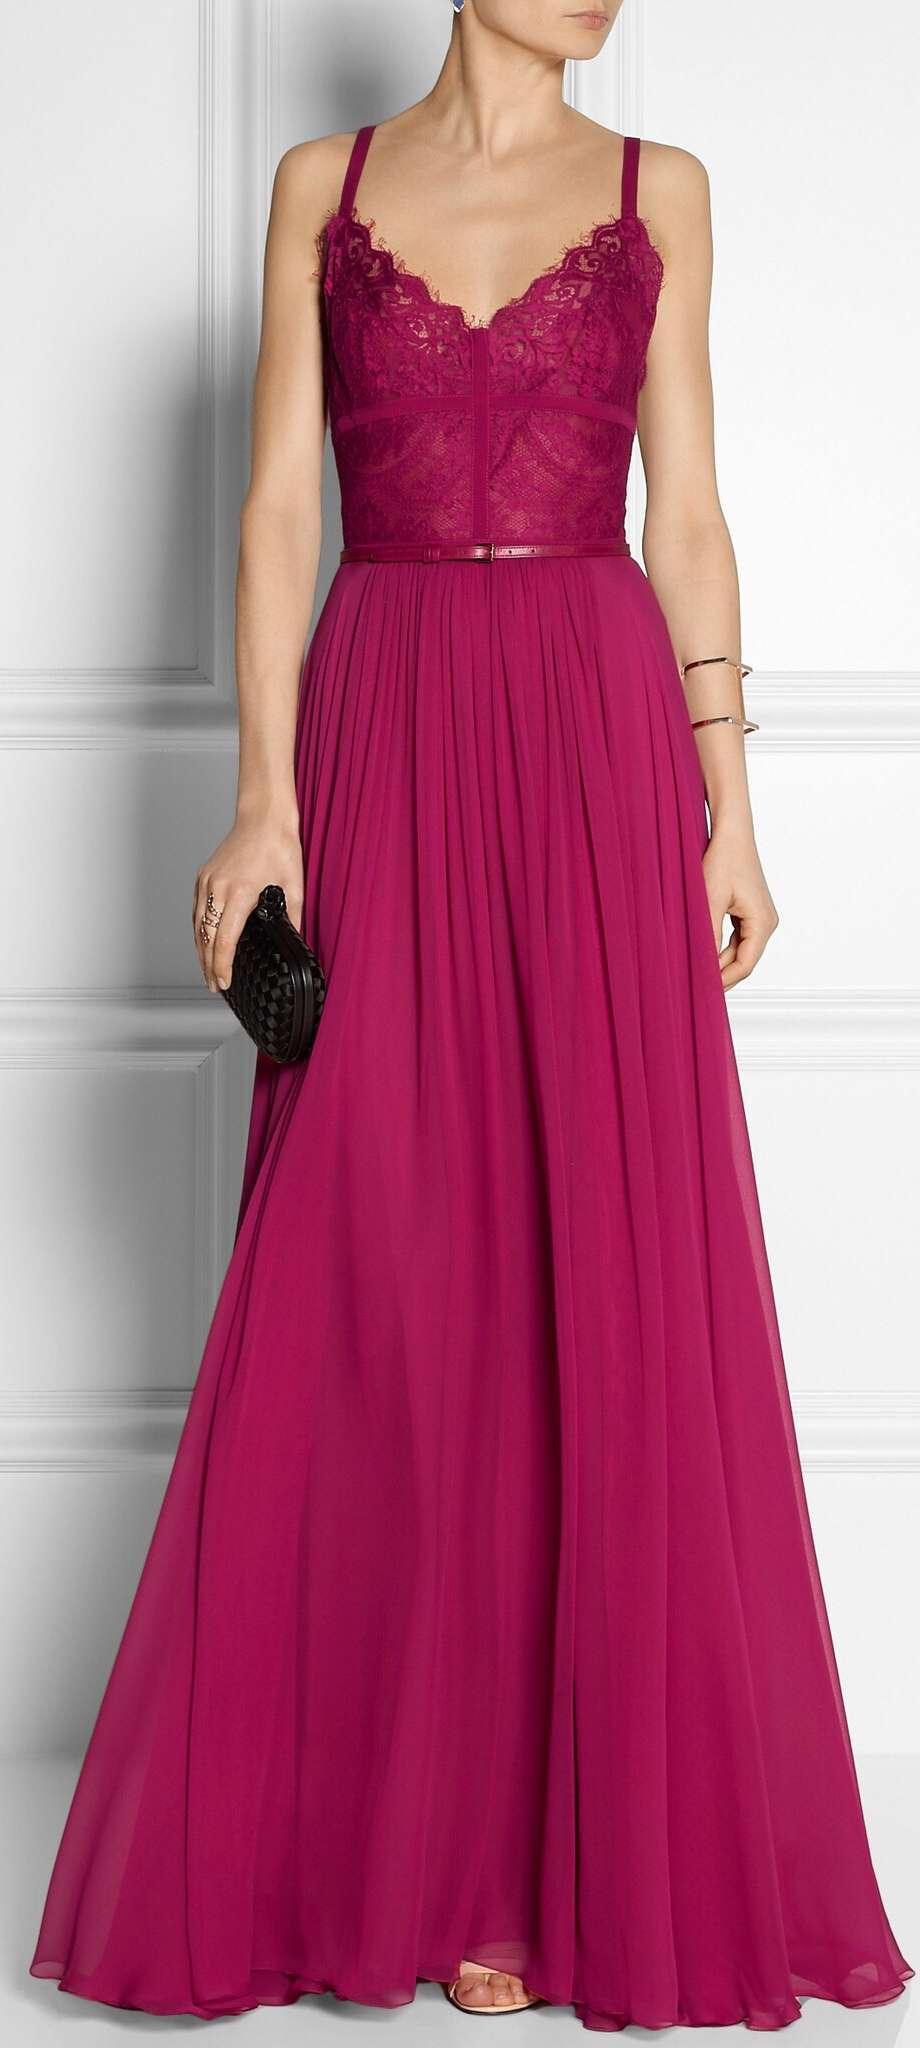 vestido frambuesa con cinturon para boda de noche